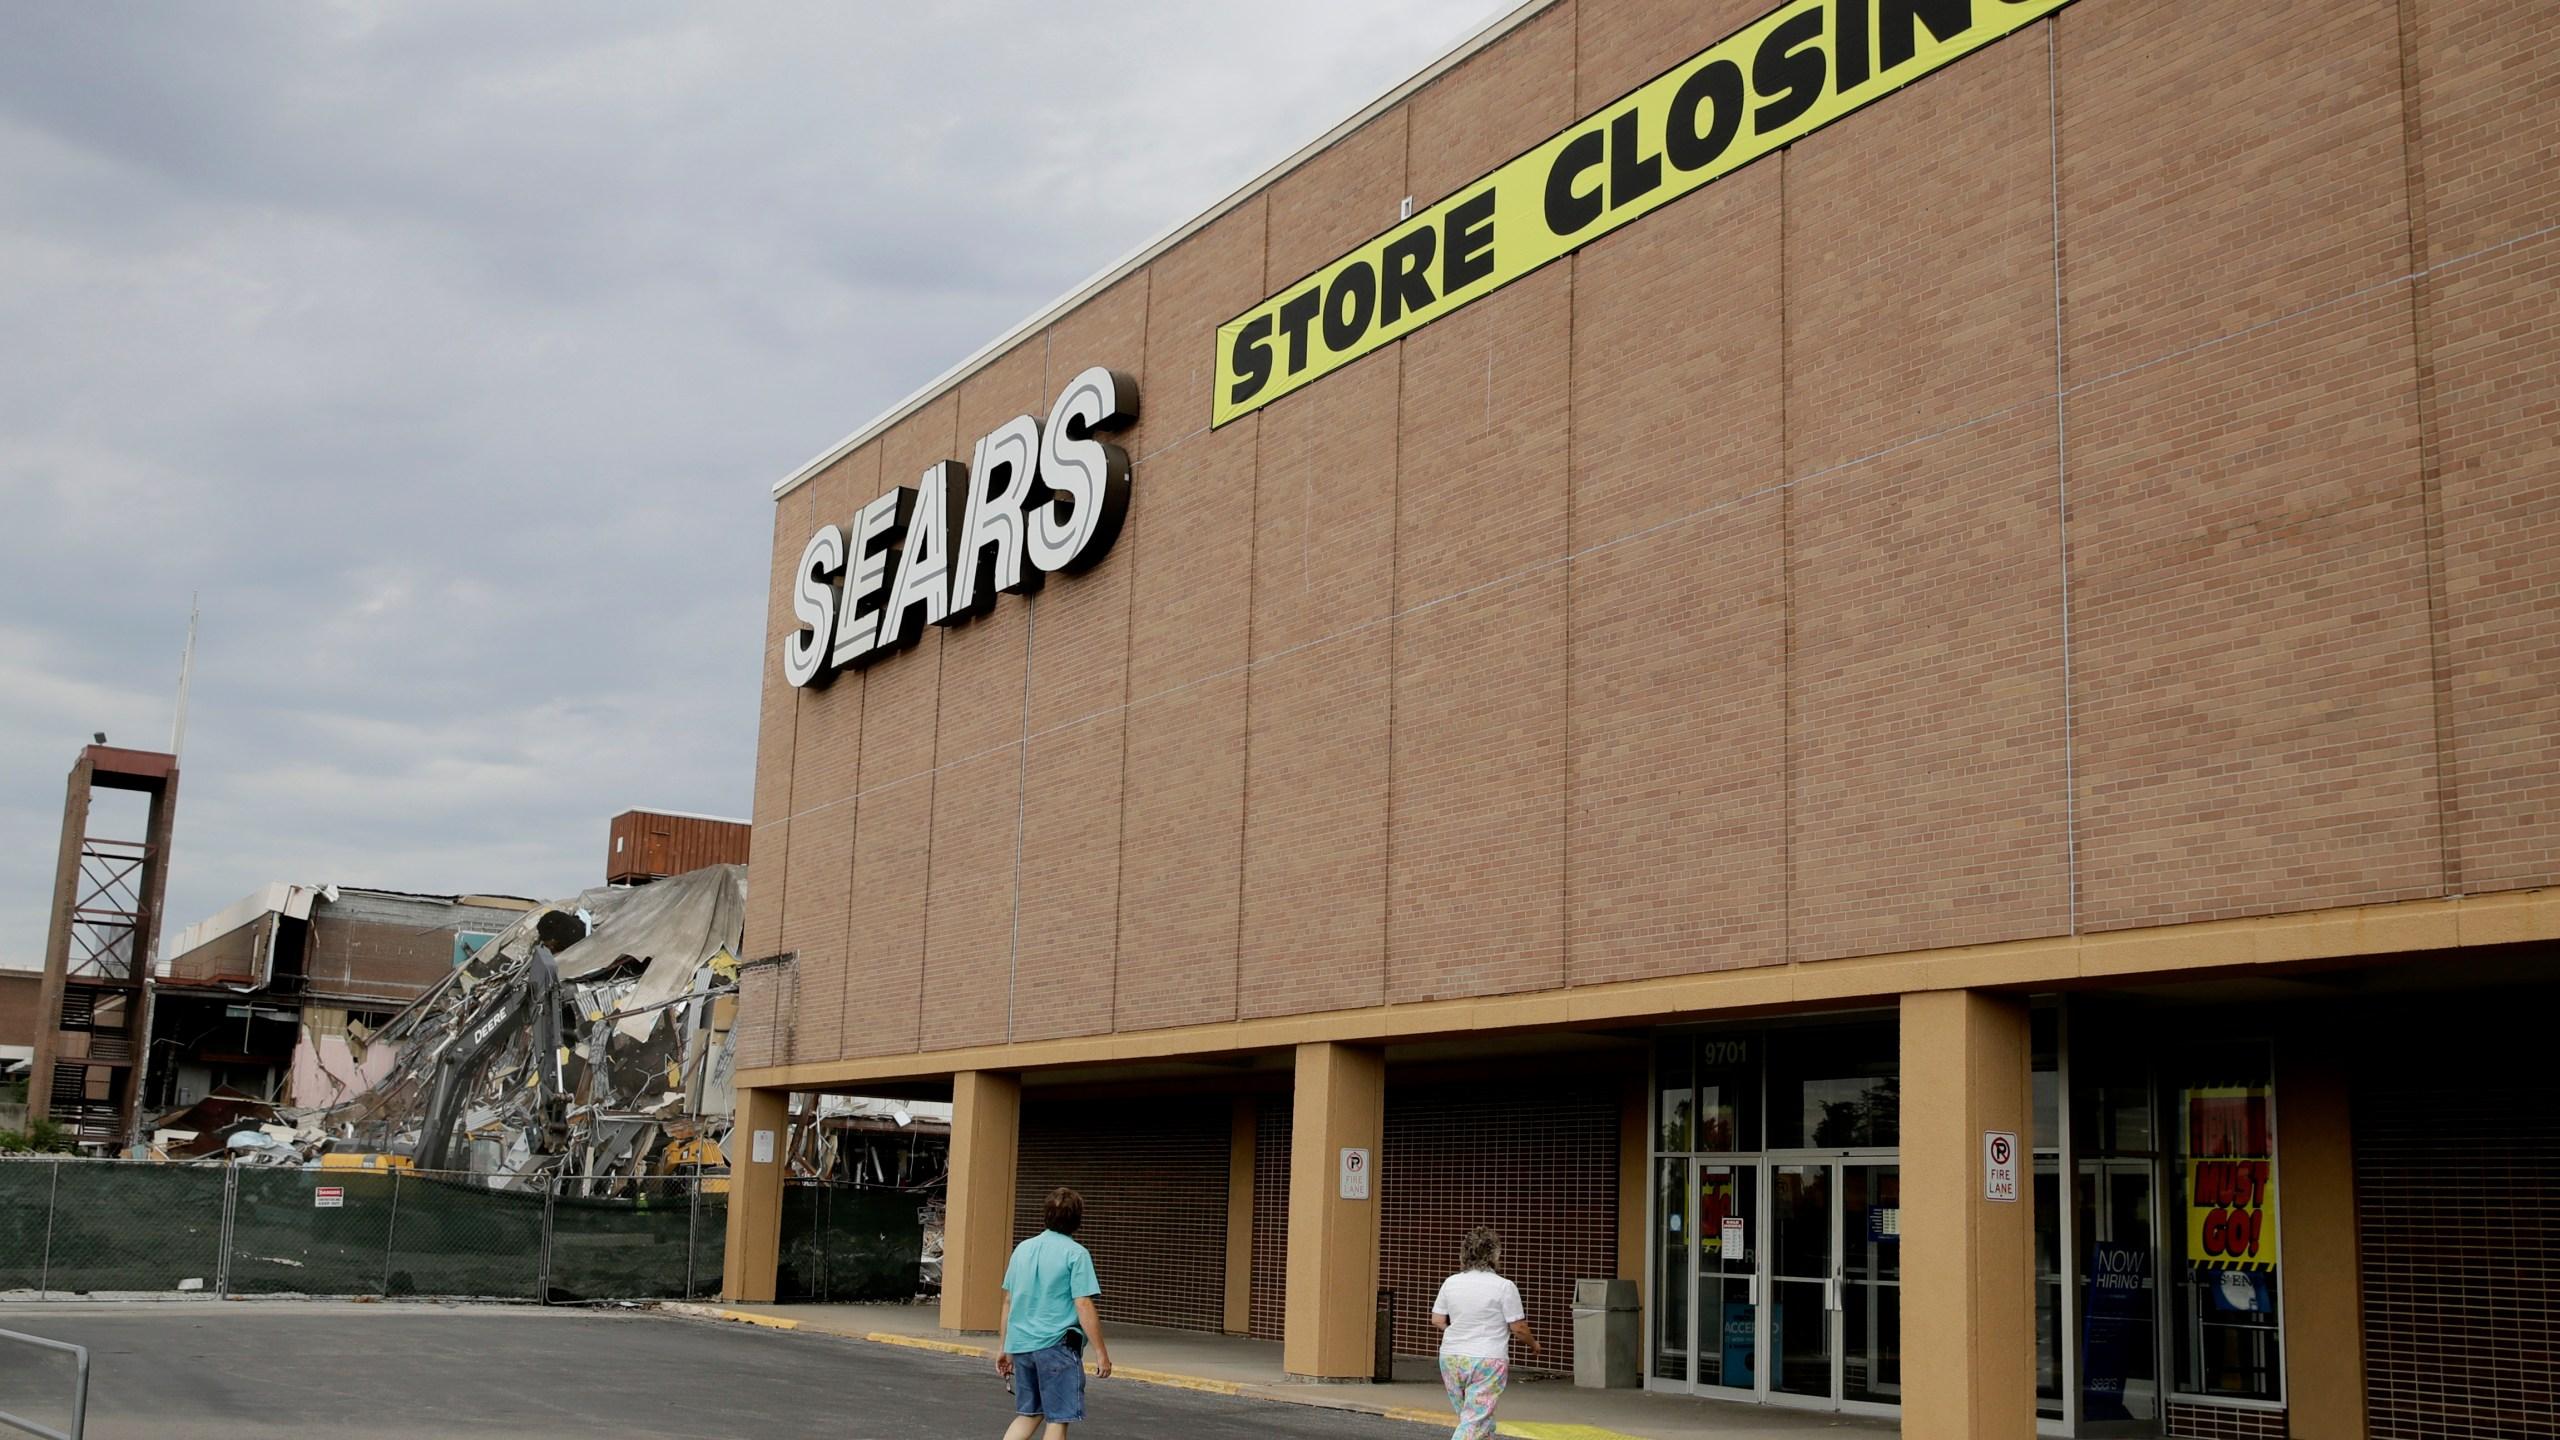 Sears_25780-159532.jpg29032198